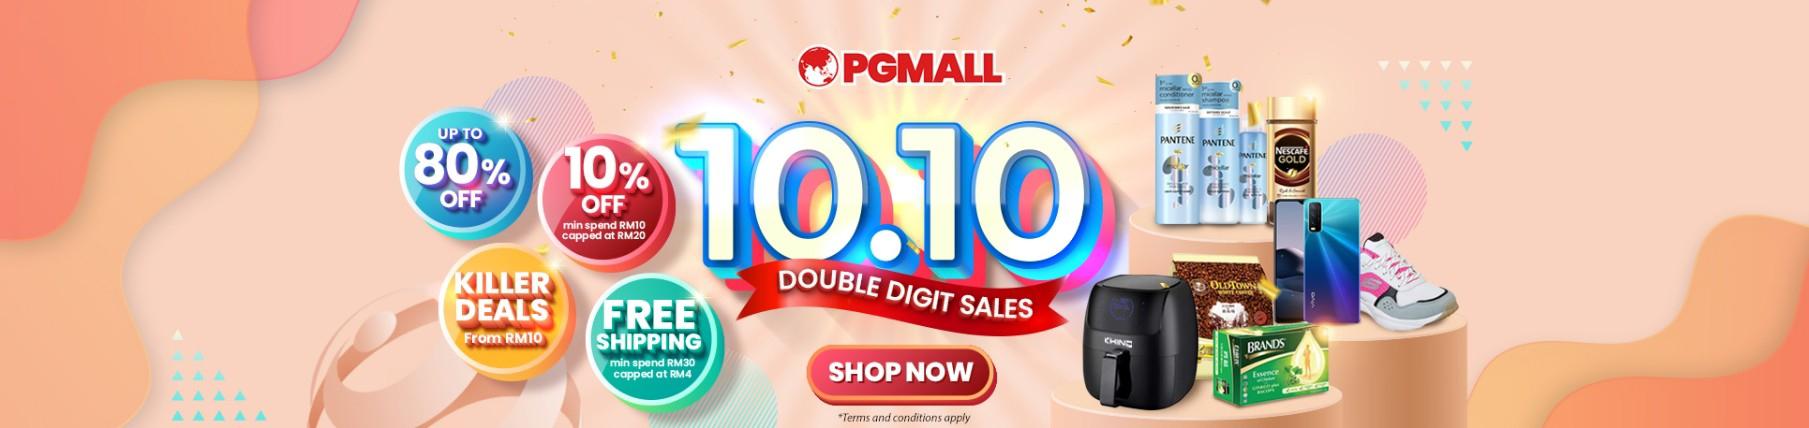 PG MALL 1010 Sale